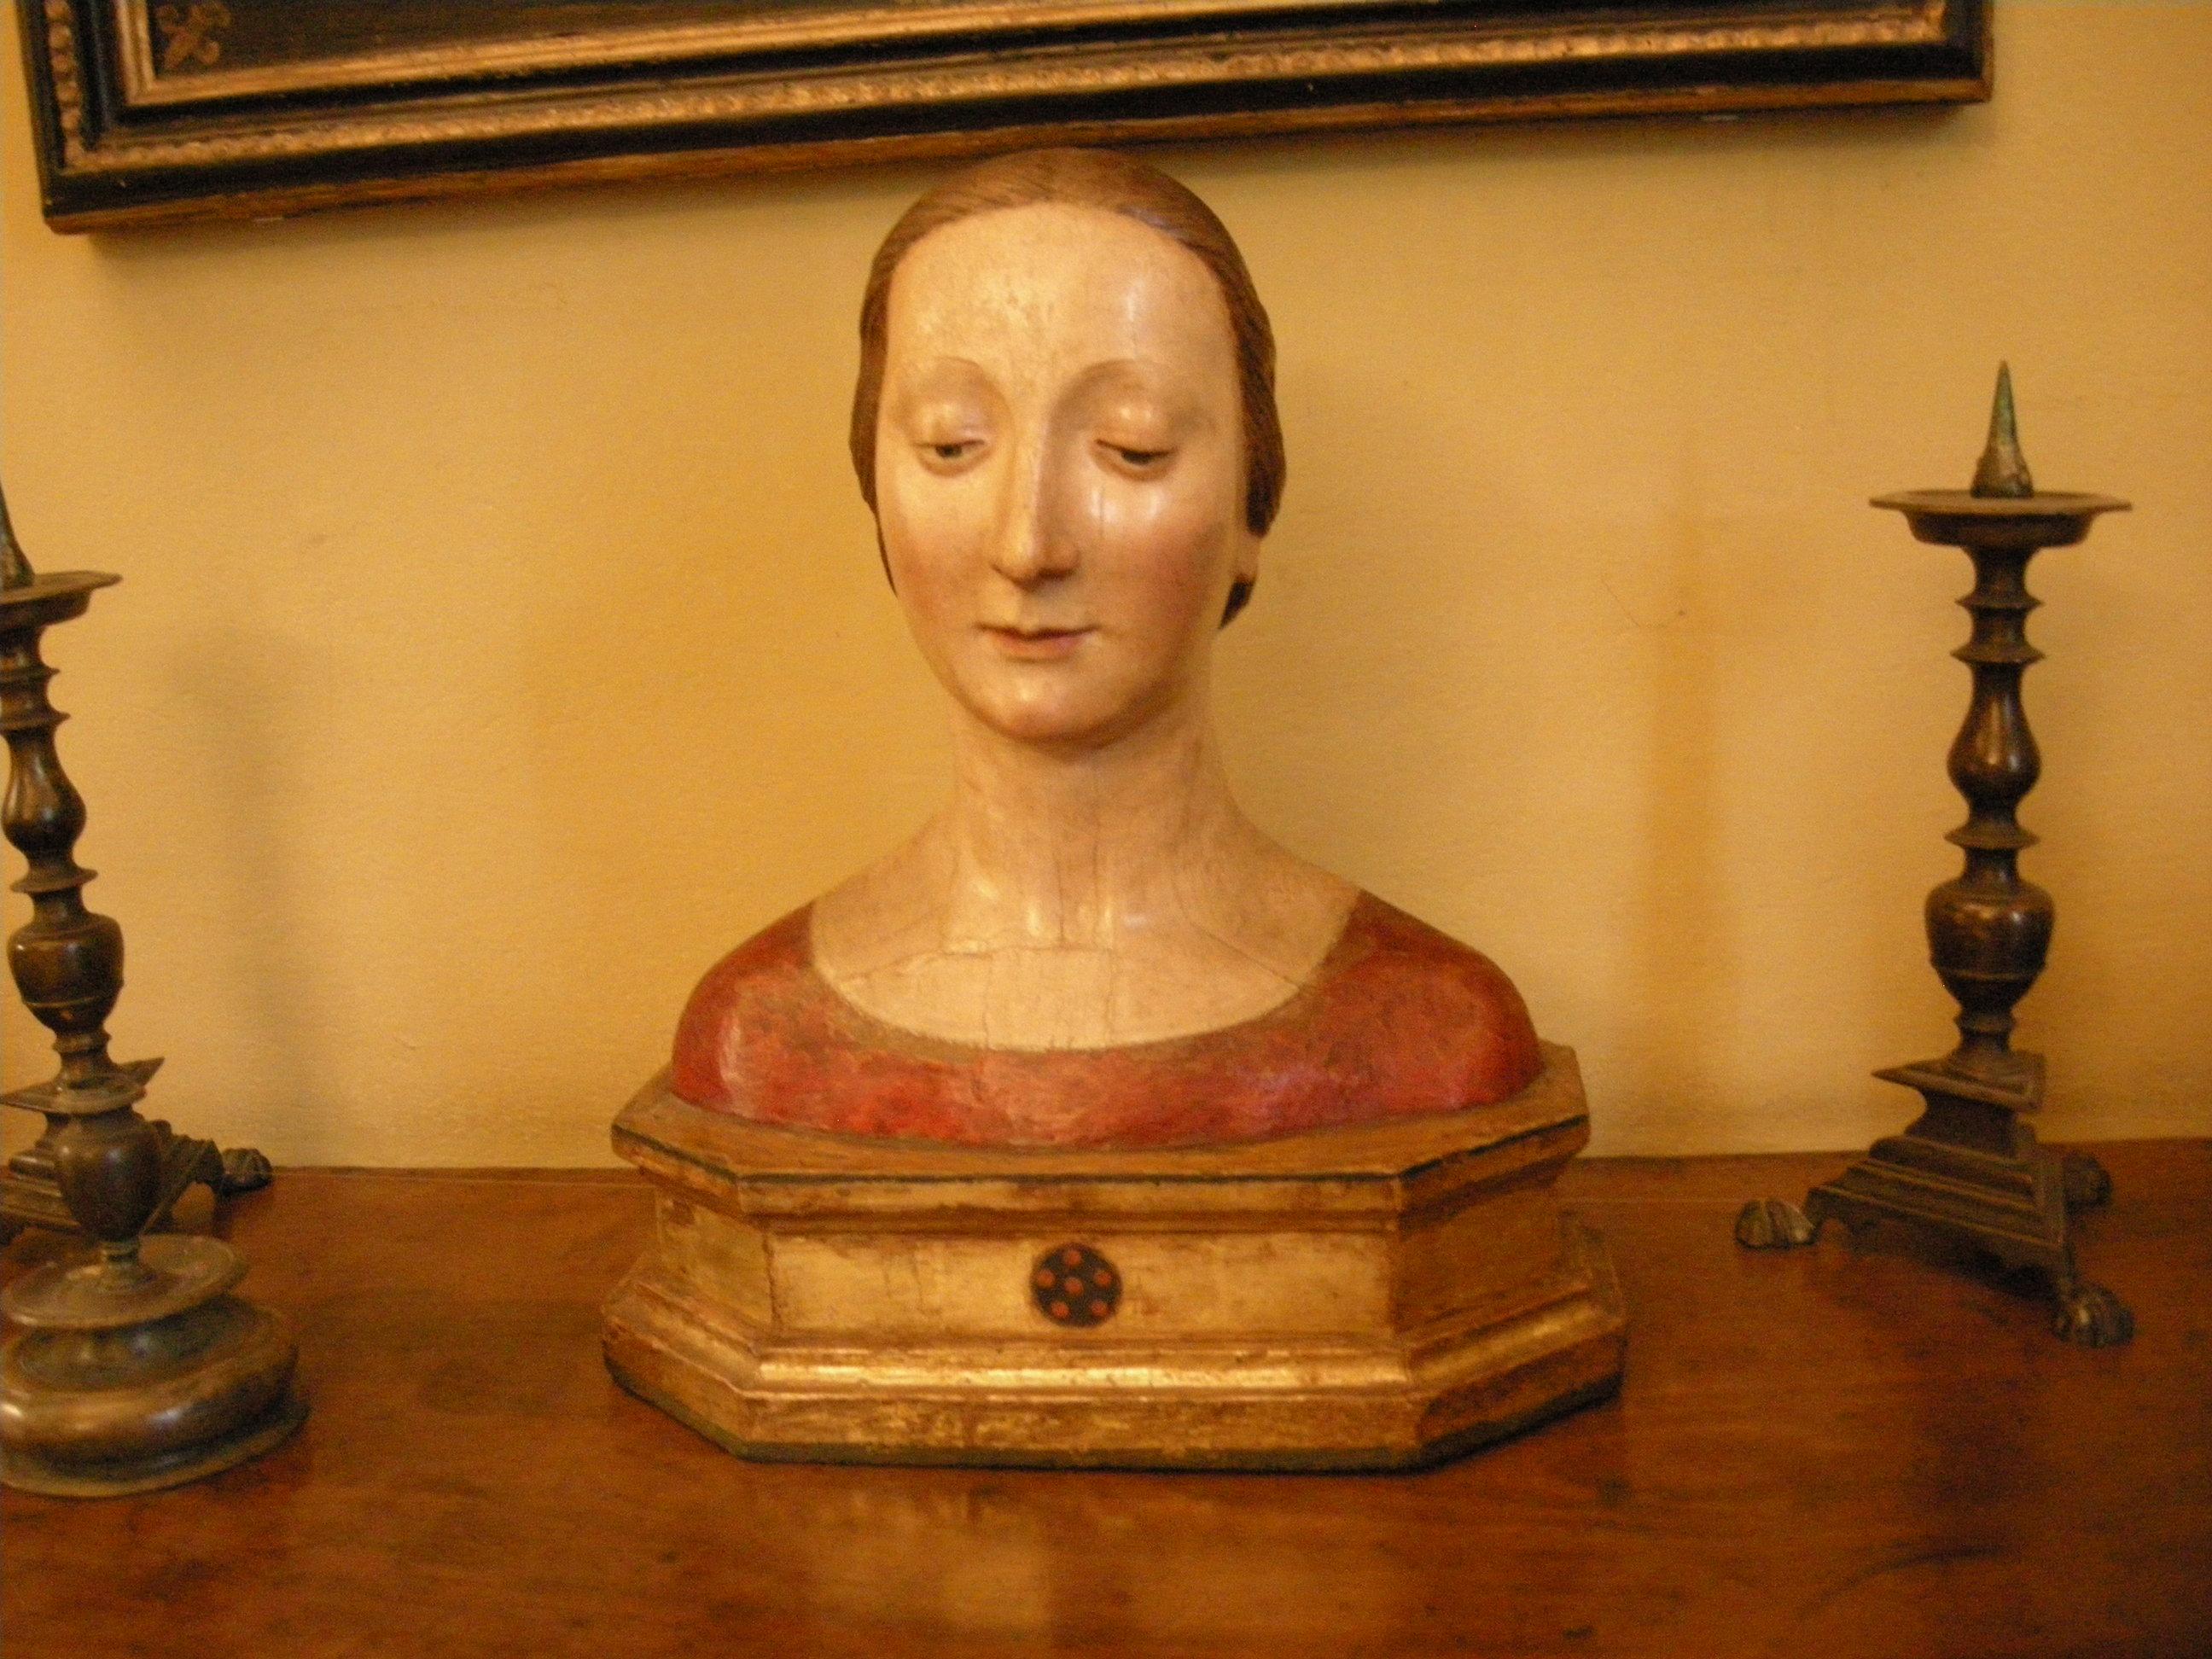 File:Casa Siviero Sala Da Pranzo Busto Reliquiario.JPG Wikimedia  #666666 2592 1944 Zona Sala Da Pranzo